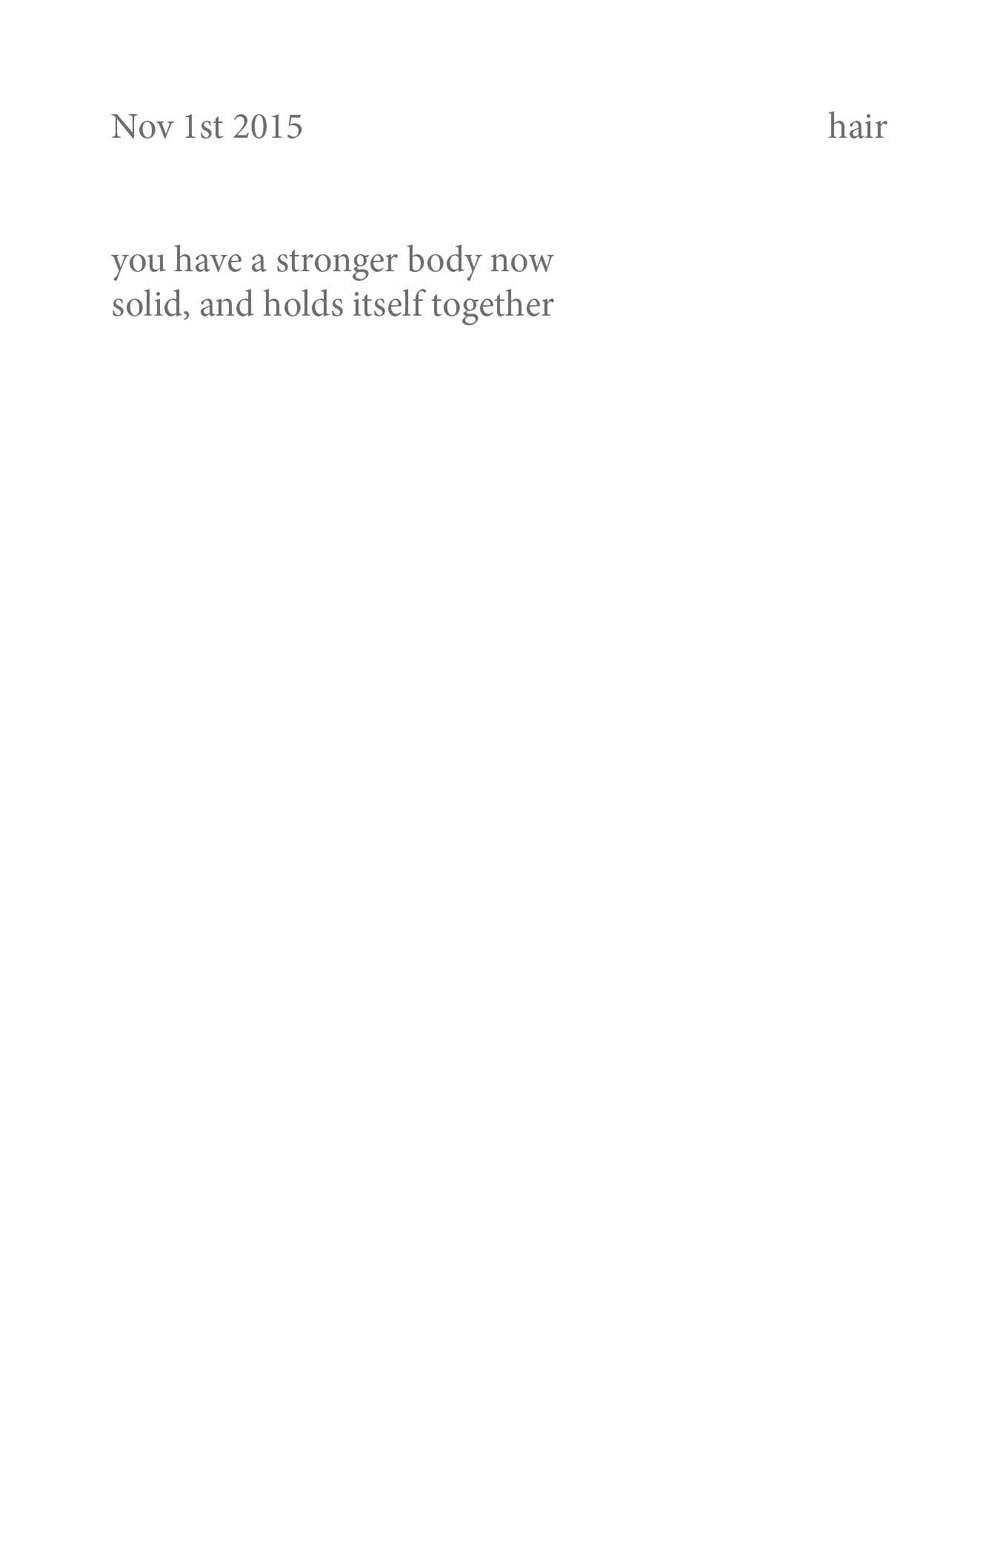 reflection writing_book31.jpg